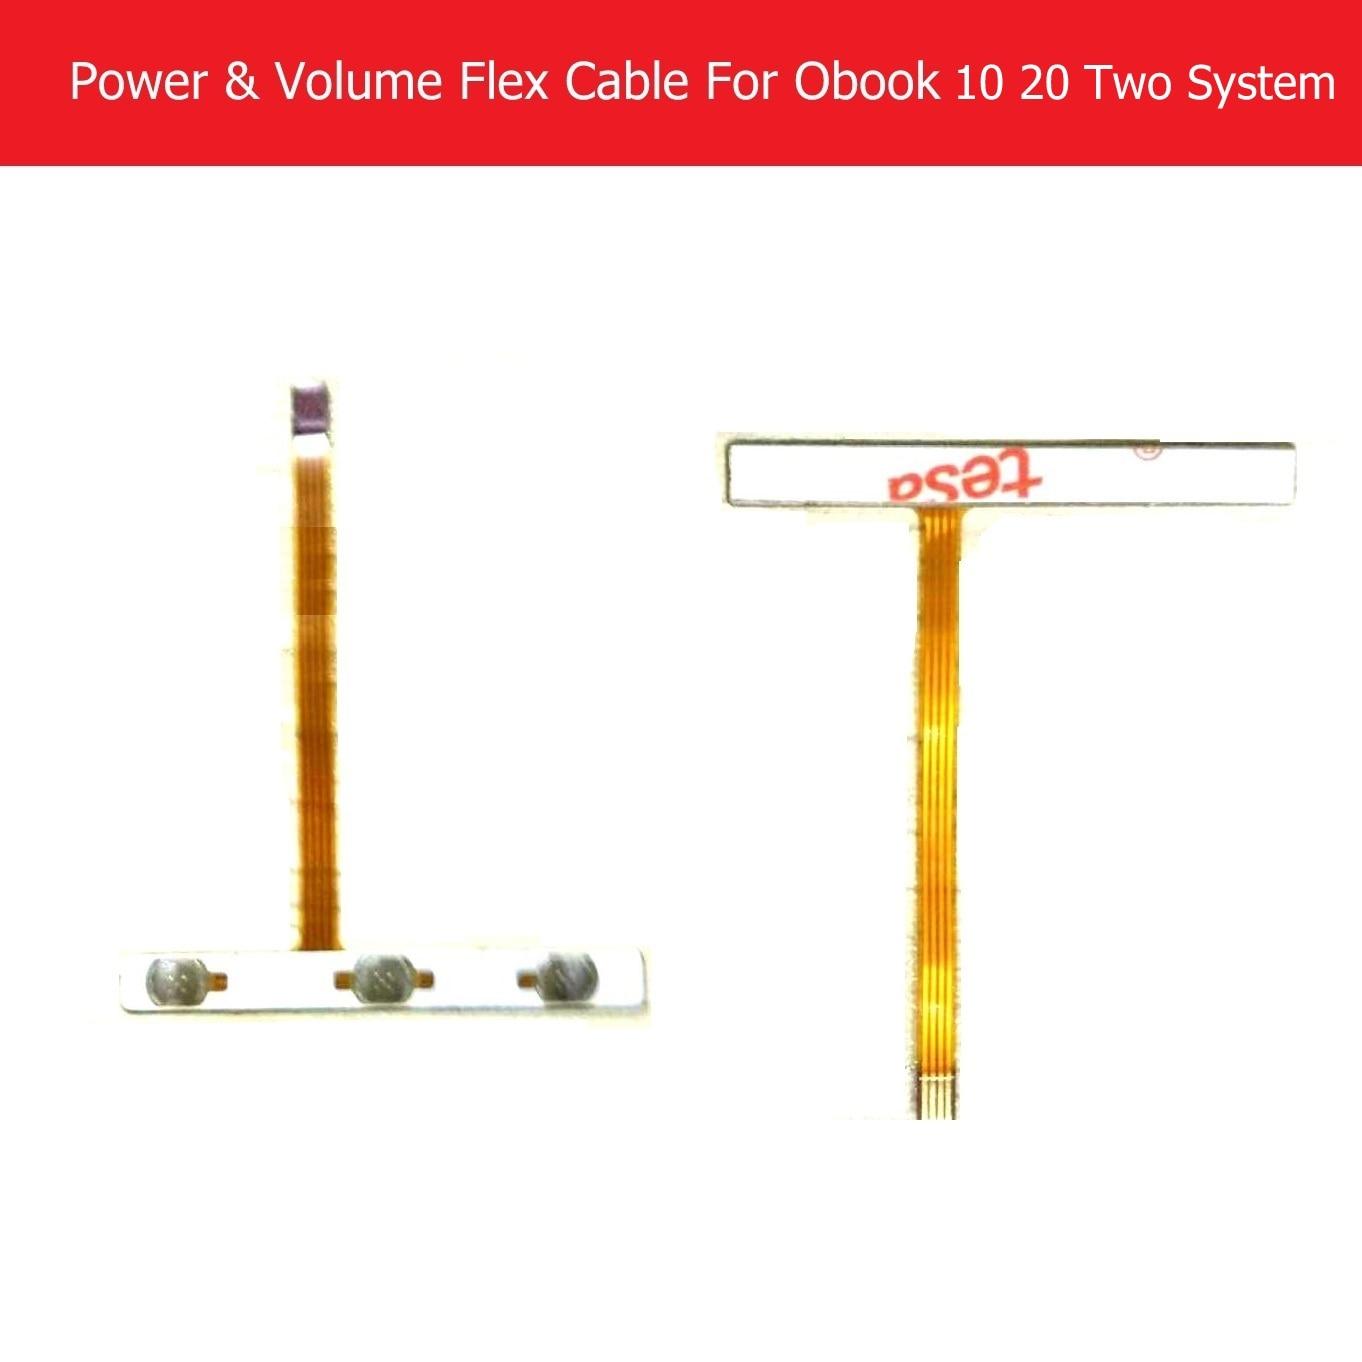 Original power & volume cabo flexível para onda obook 10 20 sistema duplo interruptor chave lateral do teclado interruptor de botão cabo flexível substituição